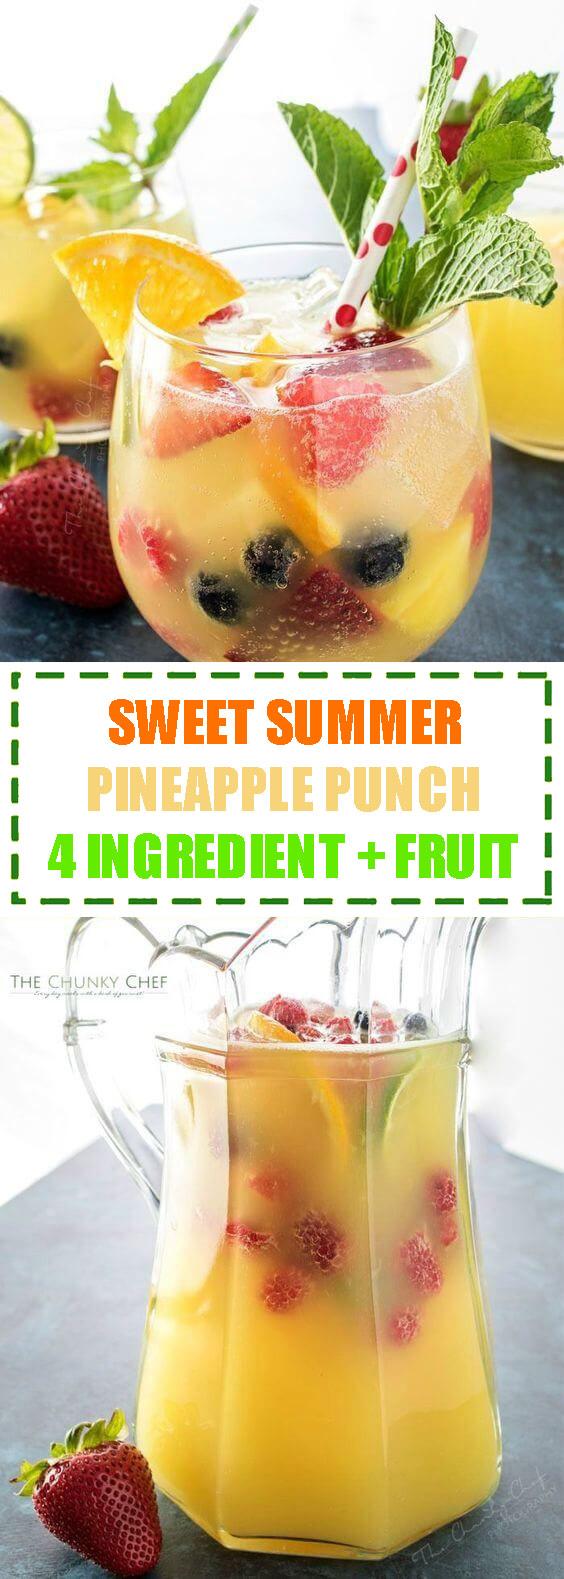 Sweet Summer Pineapple Punch